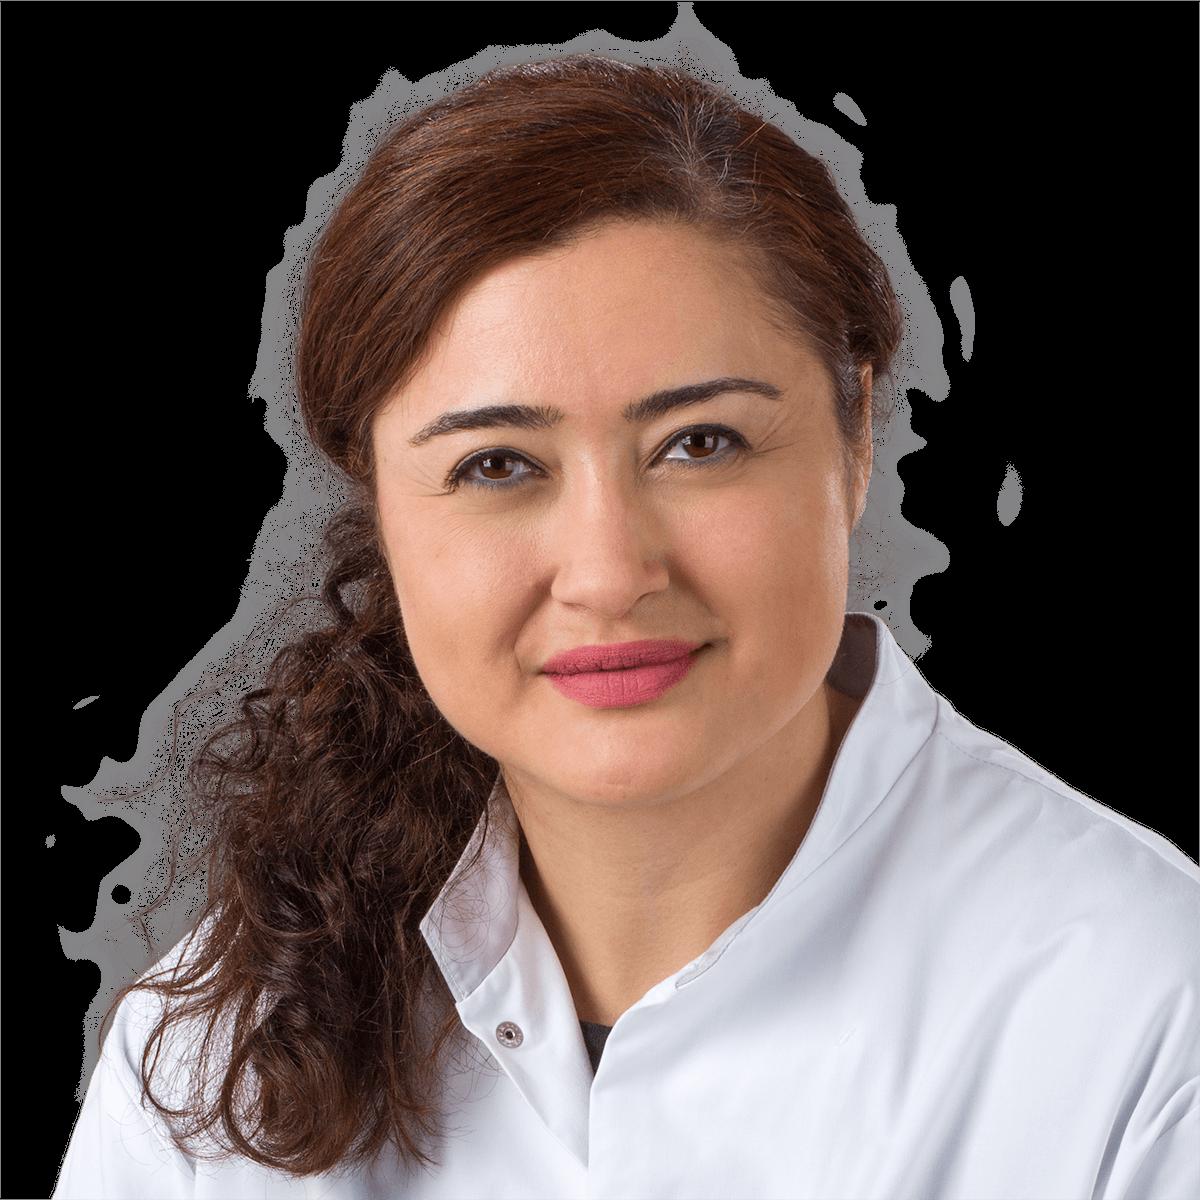 Dr. Ç.  Baharvand-Öztürk